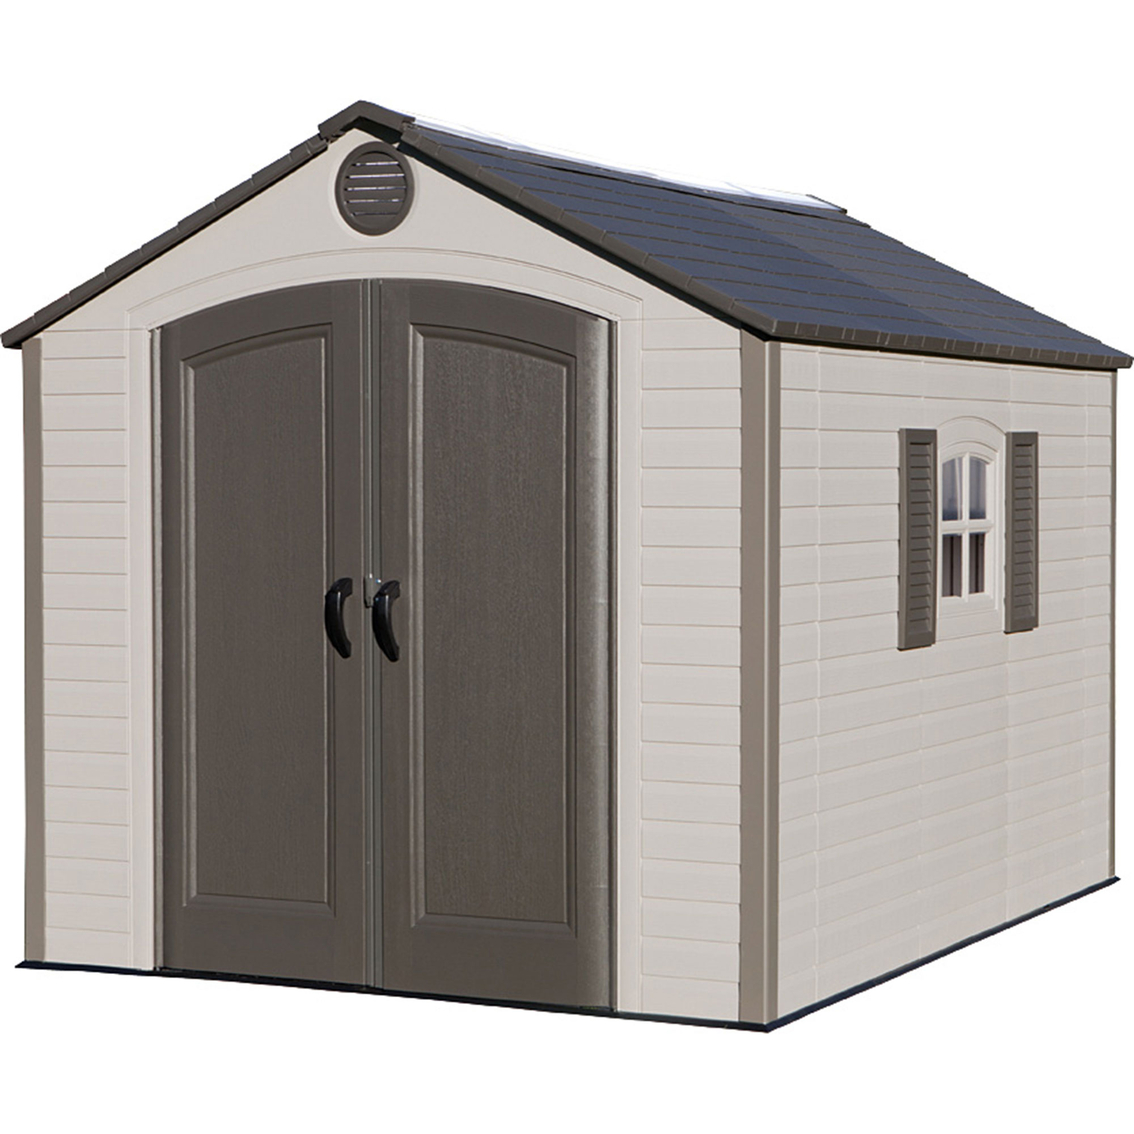 exchange more patio lawn garden storage sheds storage storage sheds